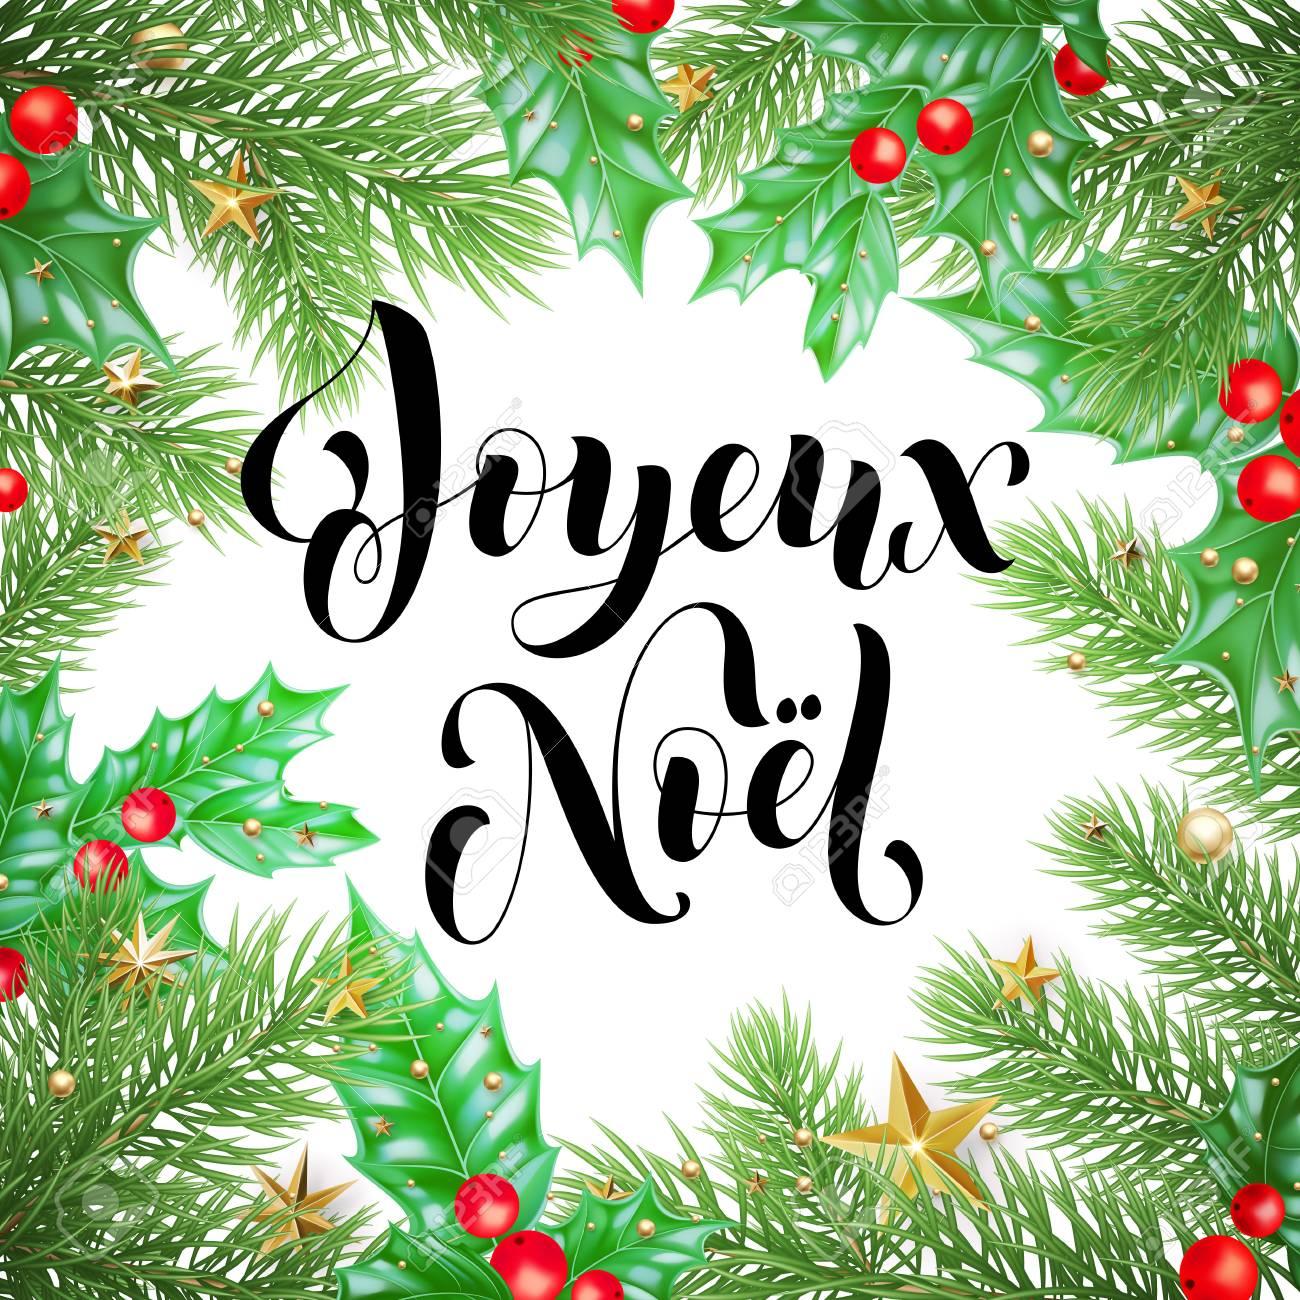 Joyeux Noel Audio.Joyeux Noel French Merry Christmas Trendy Quote Calligraphy And